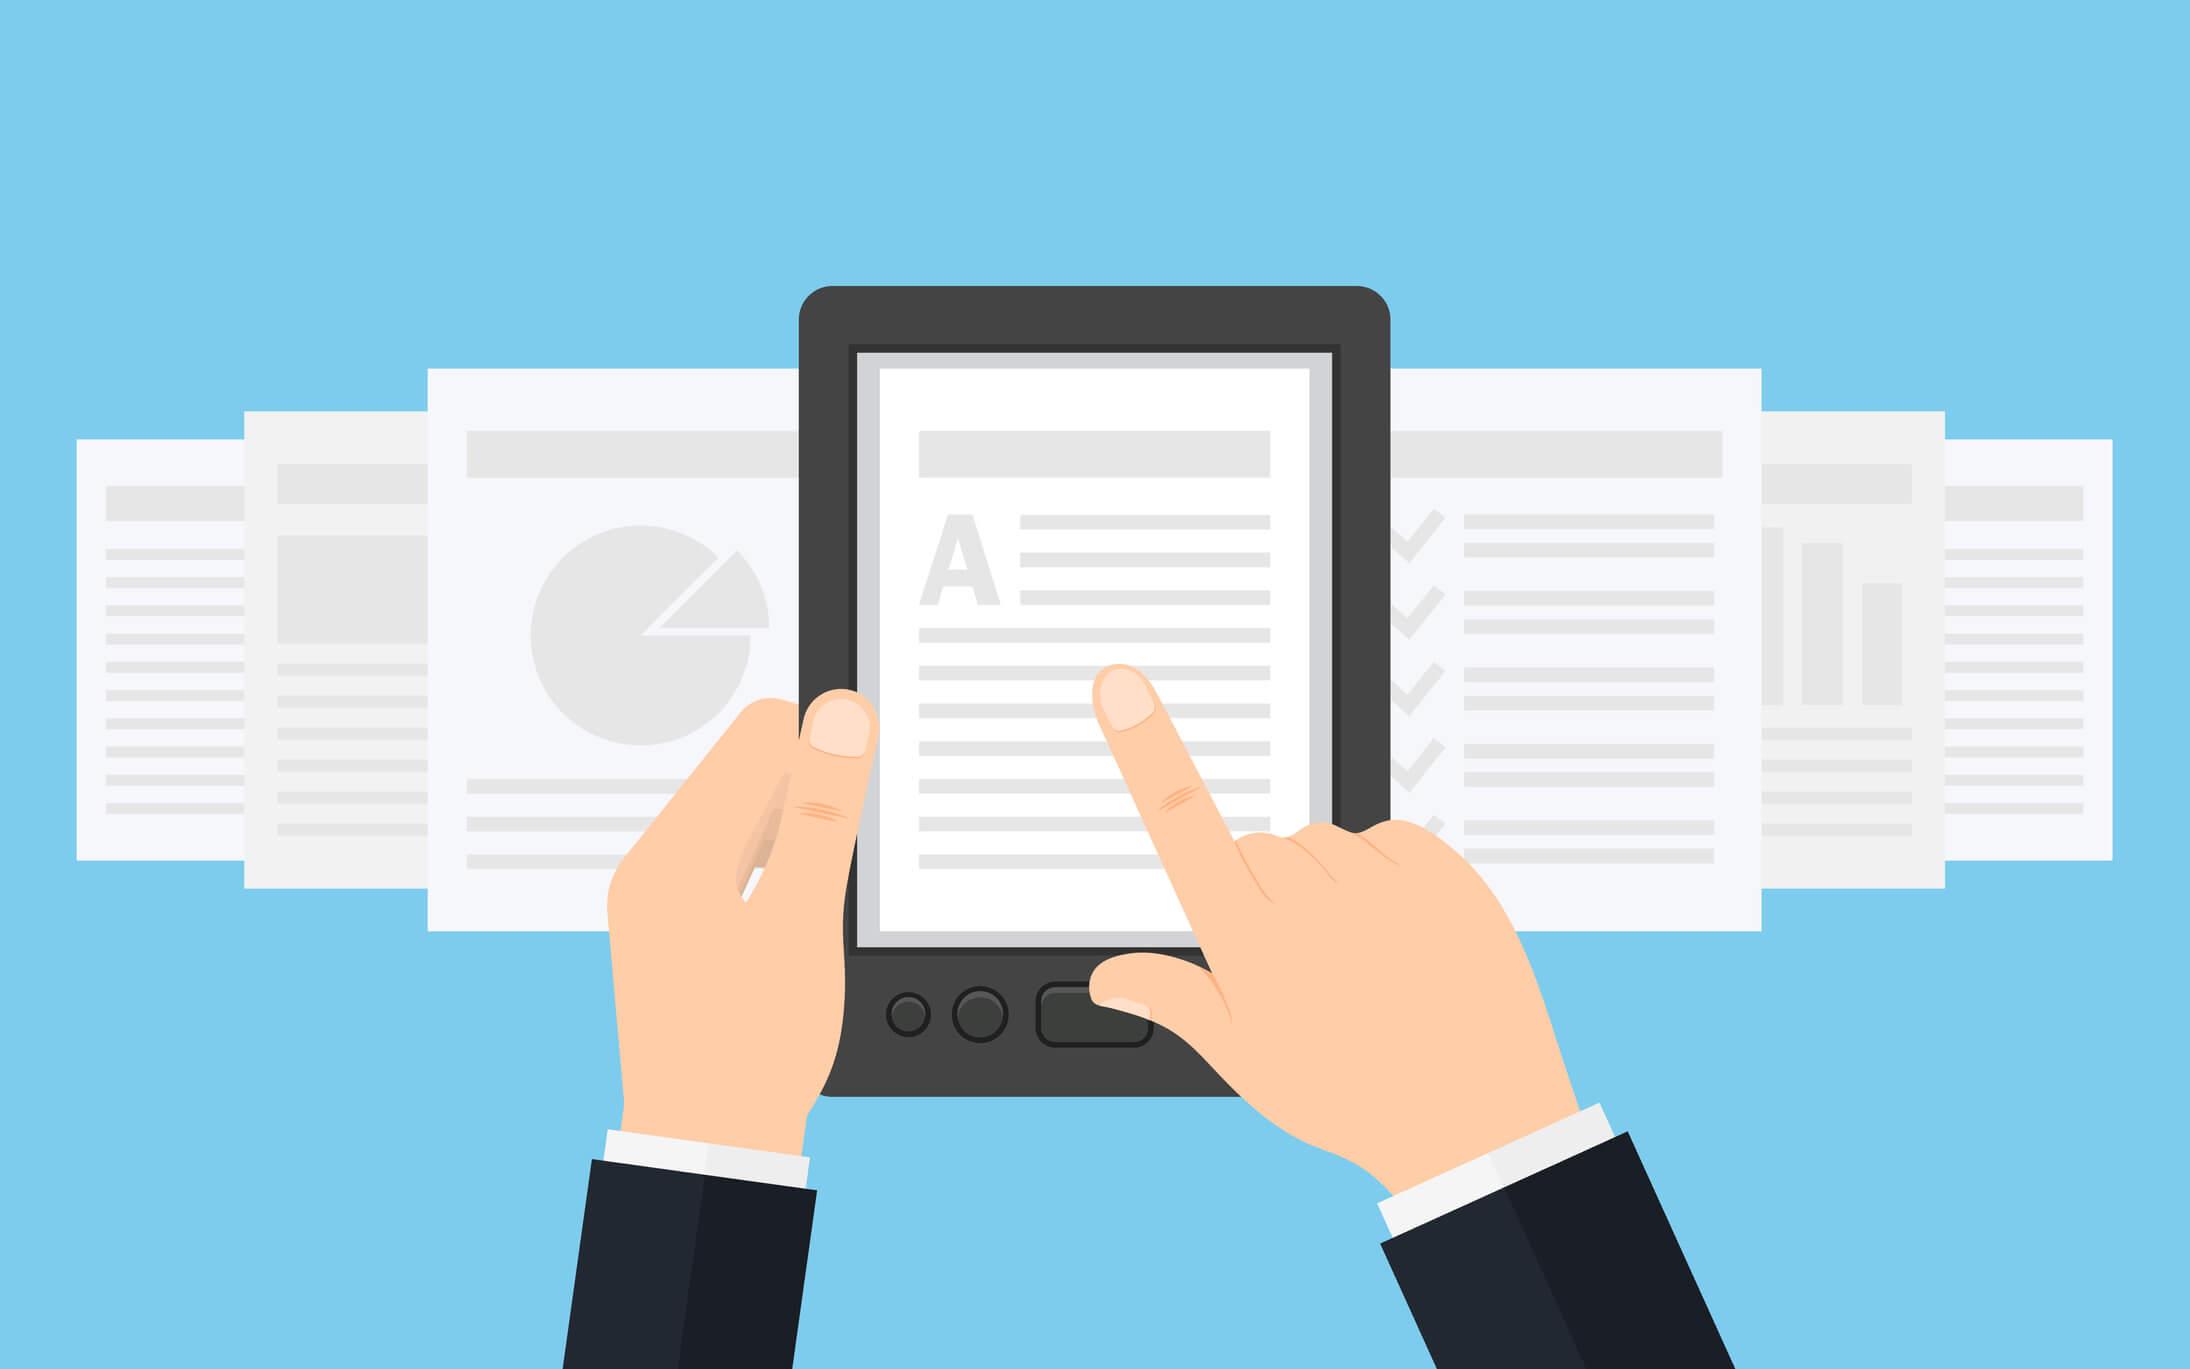 E-Book erstellen: Schritt-für-Schritt-Anleitung inkl. Vorlagen